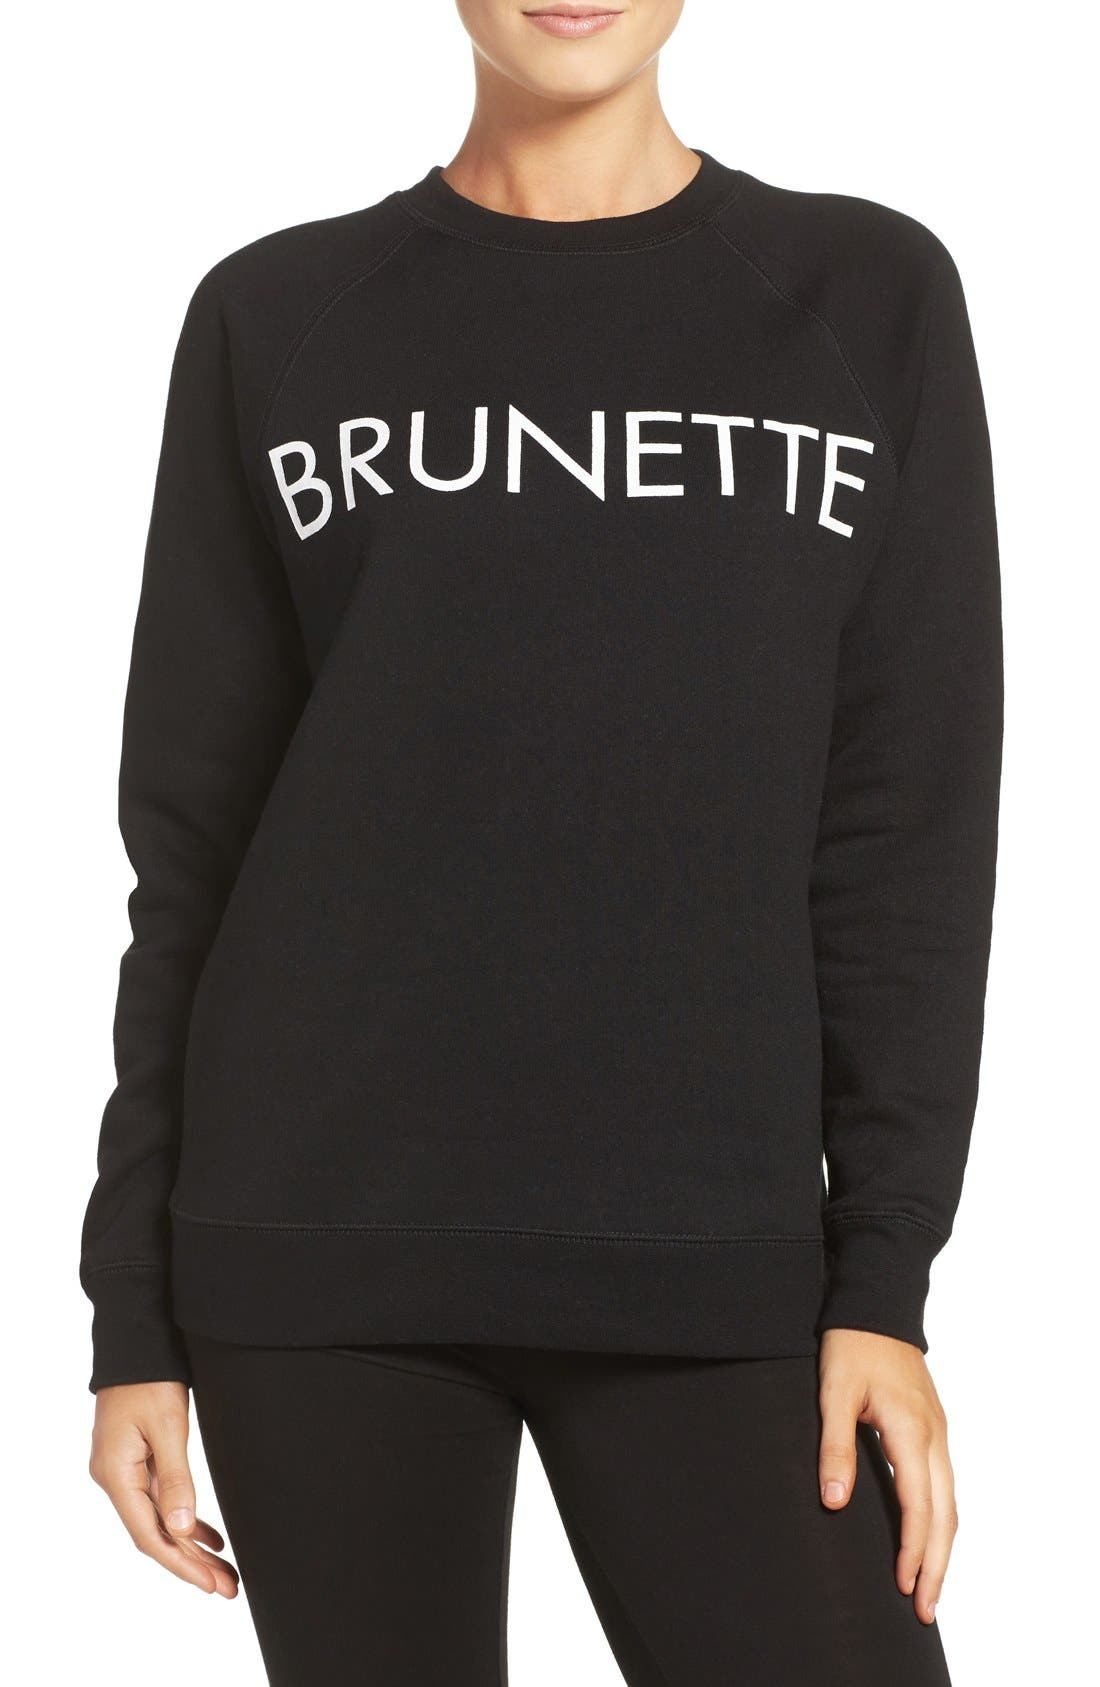 Brunette Crewneck Sweatshirt,                         Main,                         color, 001